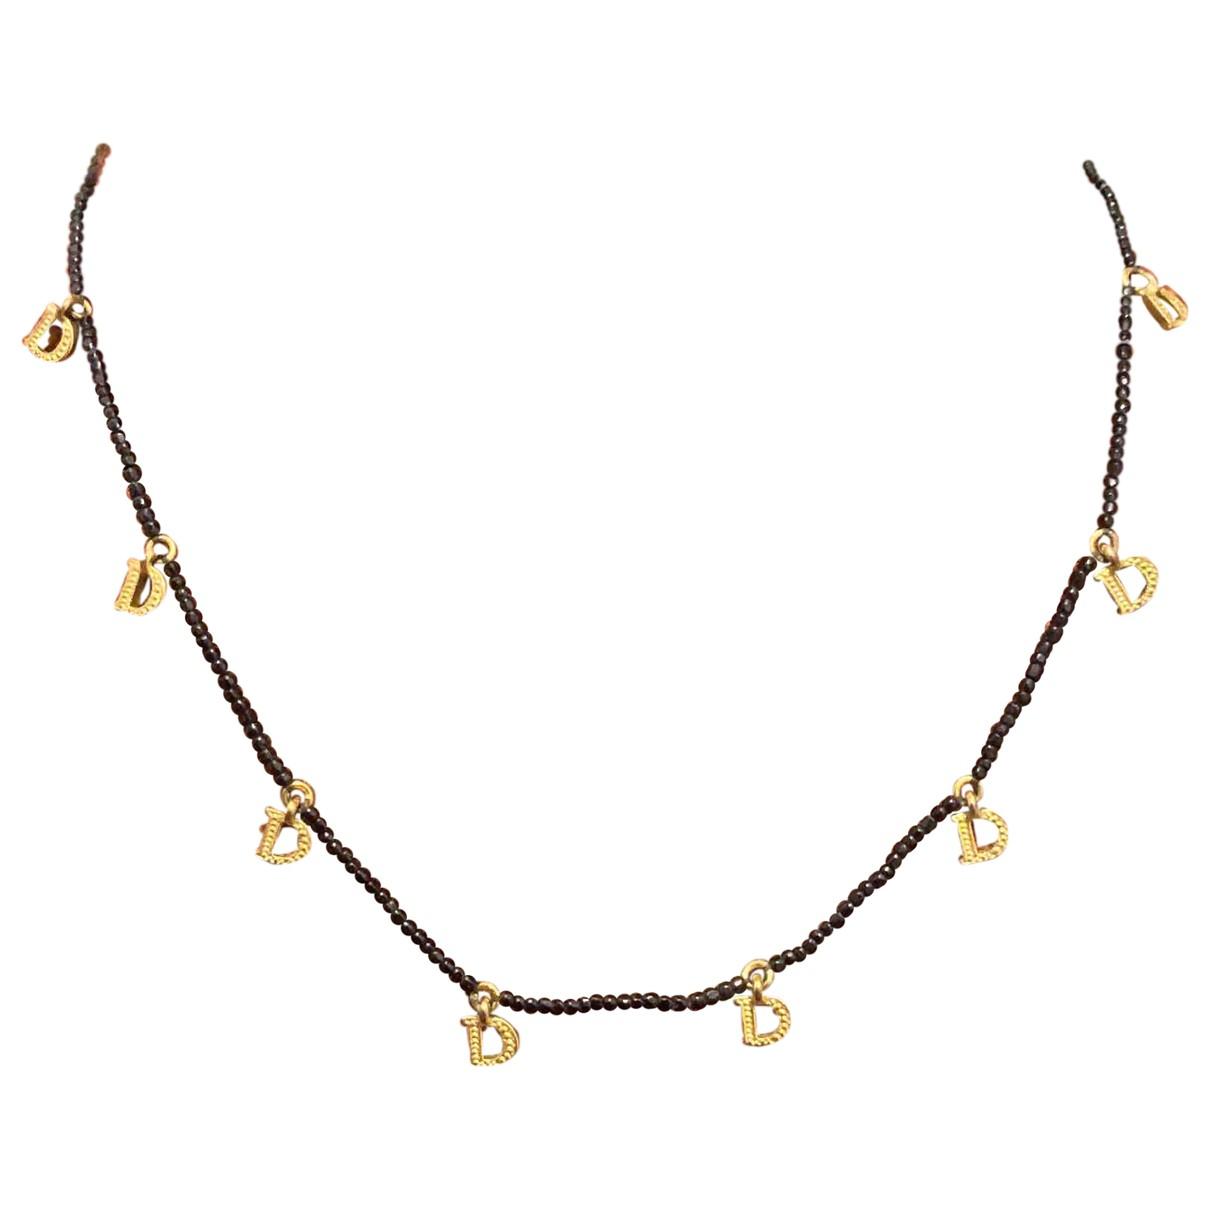 Dior Perles Kette in  Schwarz Metall